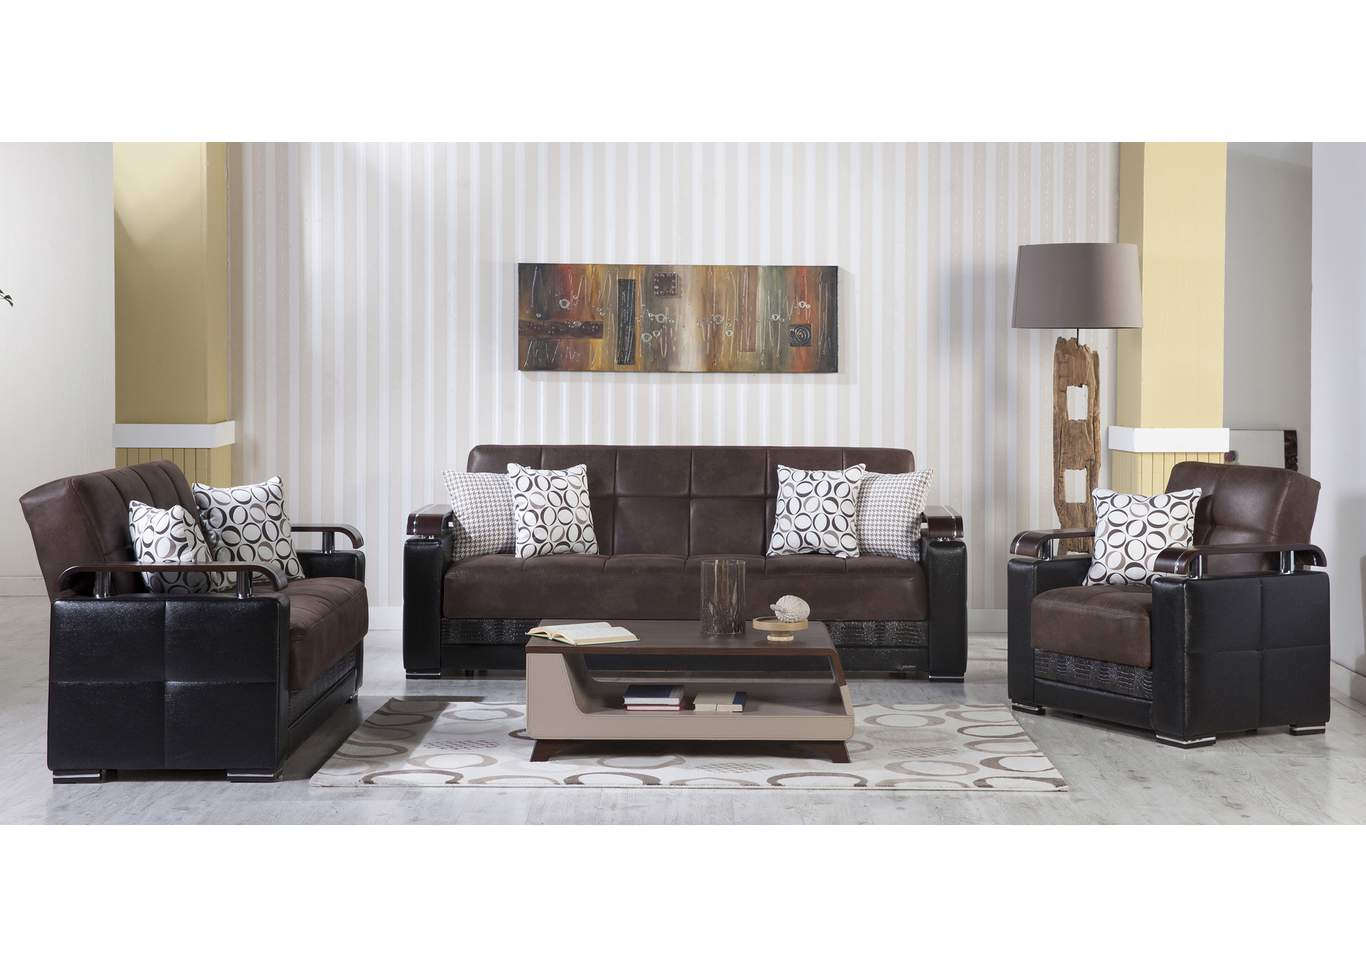 Magnificent Charisma Furniture Ekol Silverado Chocolate Sofa Loveseat Creativecarmelina Interior Chair Design Creativecarmelinacom